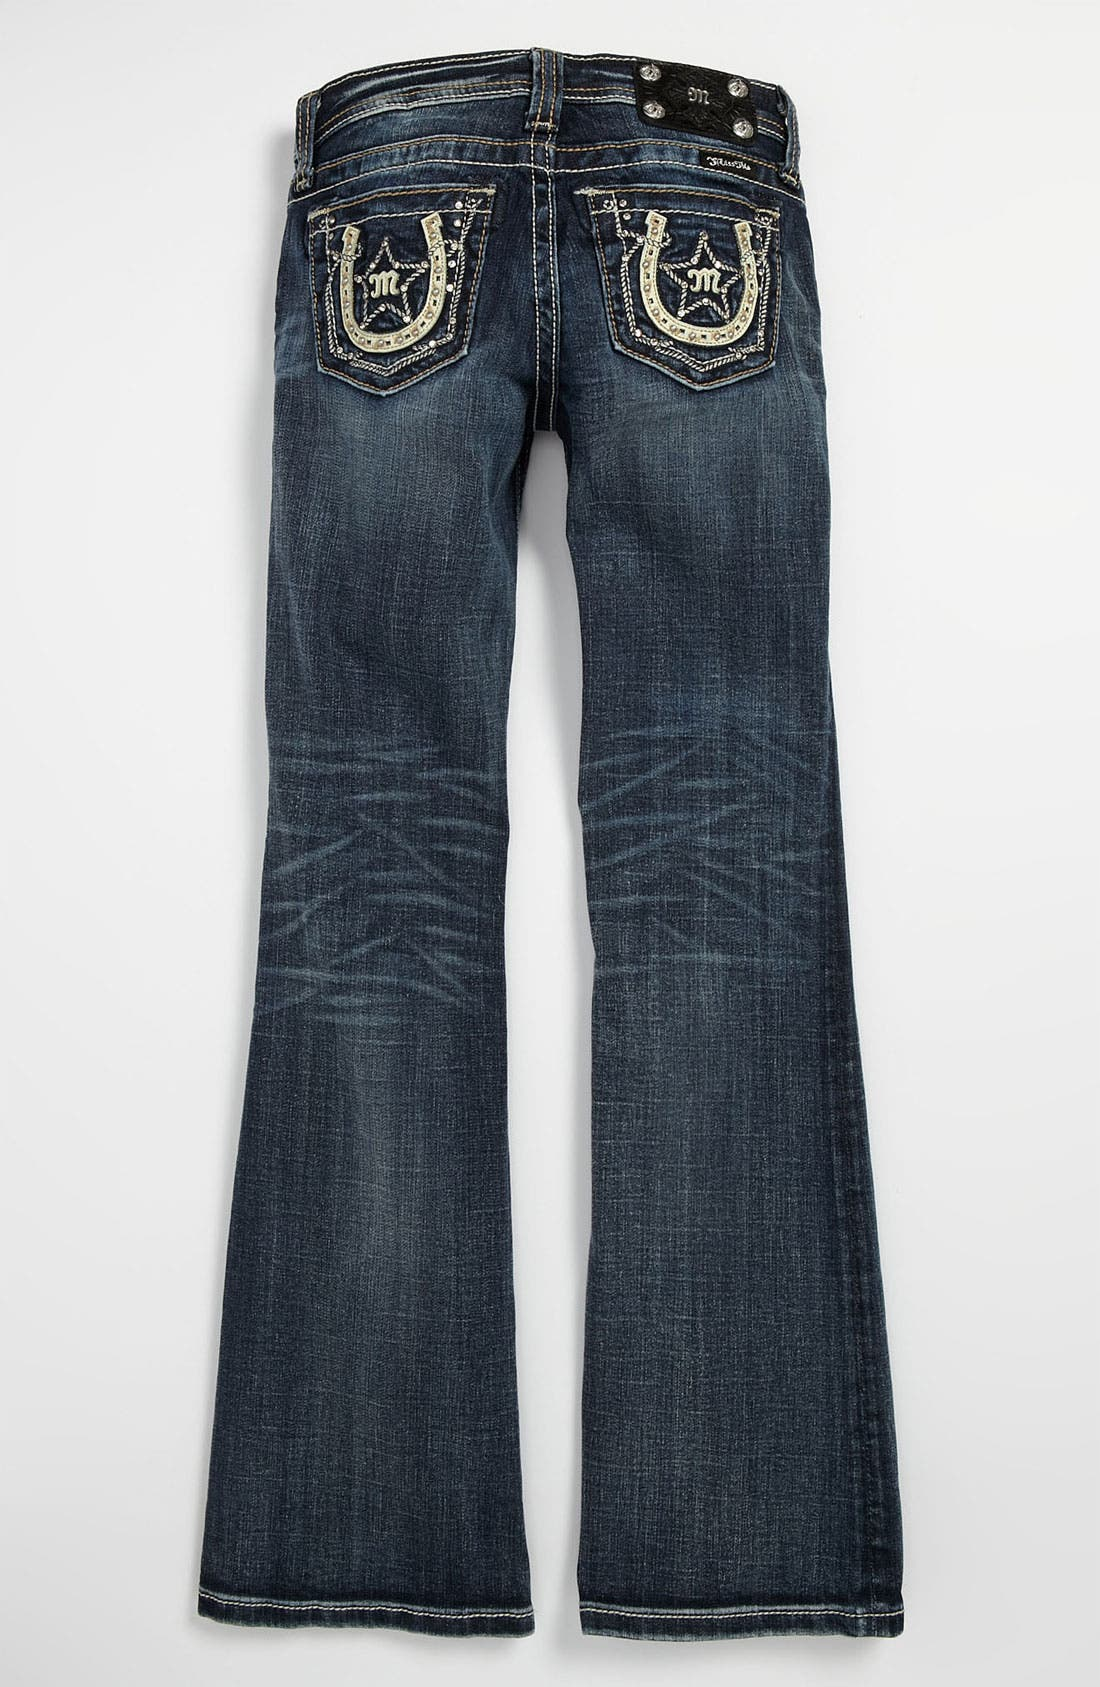 Alternate Image 1 Selected - Miss Me 'Horseshoe' Bootcut Jeans (Big Girls)